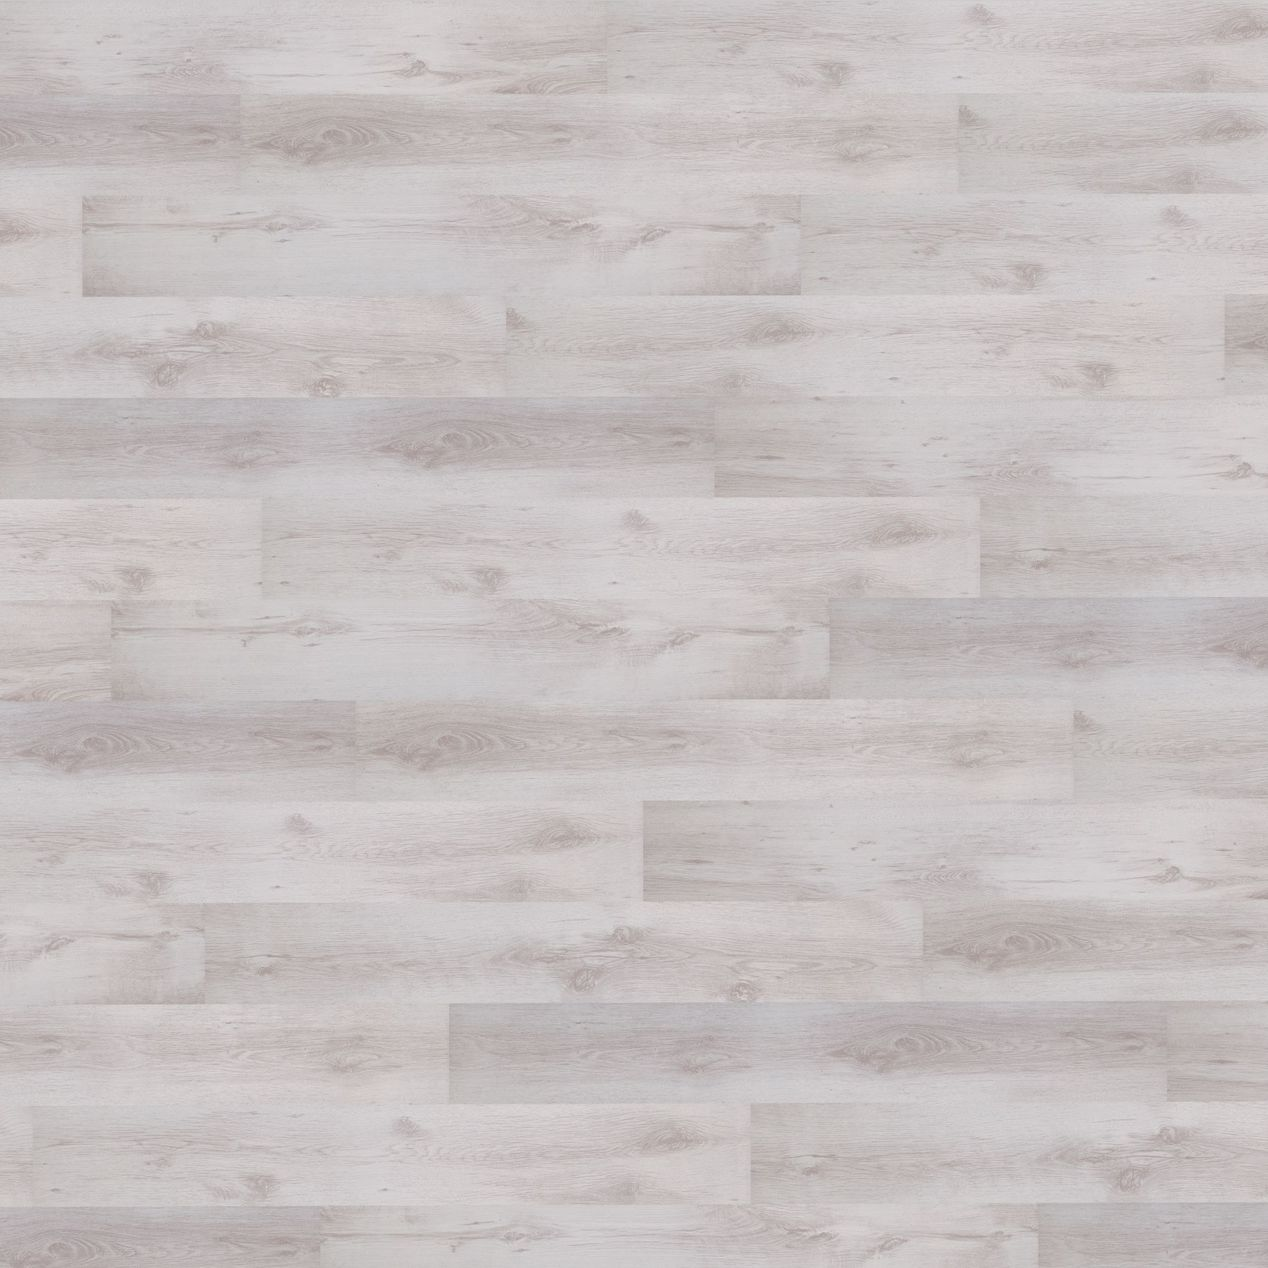 hori klick laminat selection eiche rustic wei optional mit d mmung leisten ebay. Black Bedroom Furniture Sets. Home Design Ideas